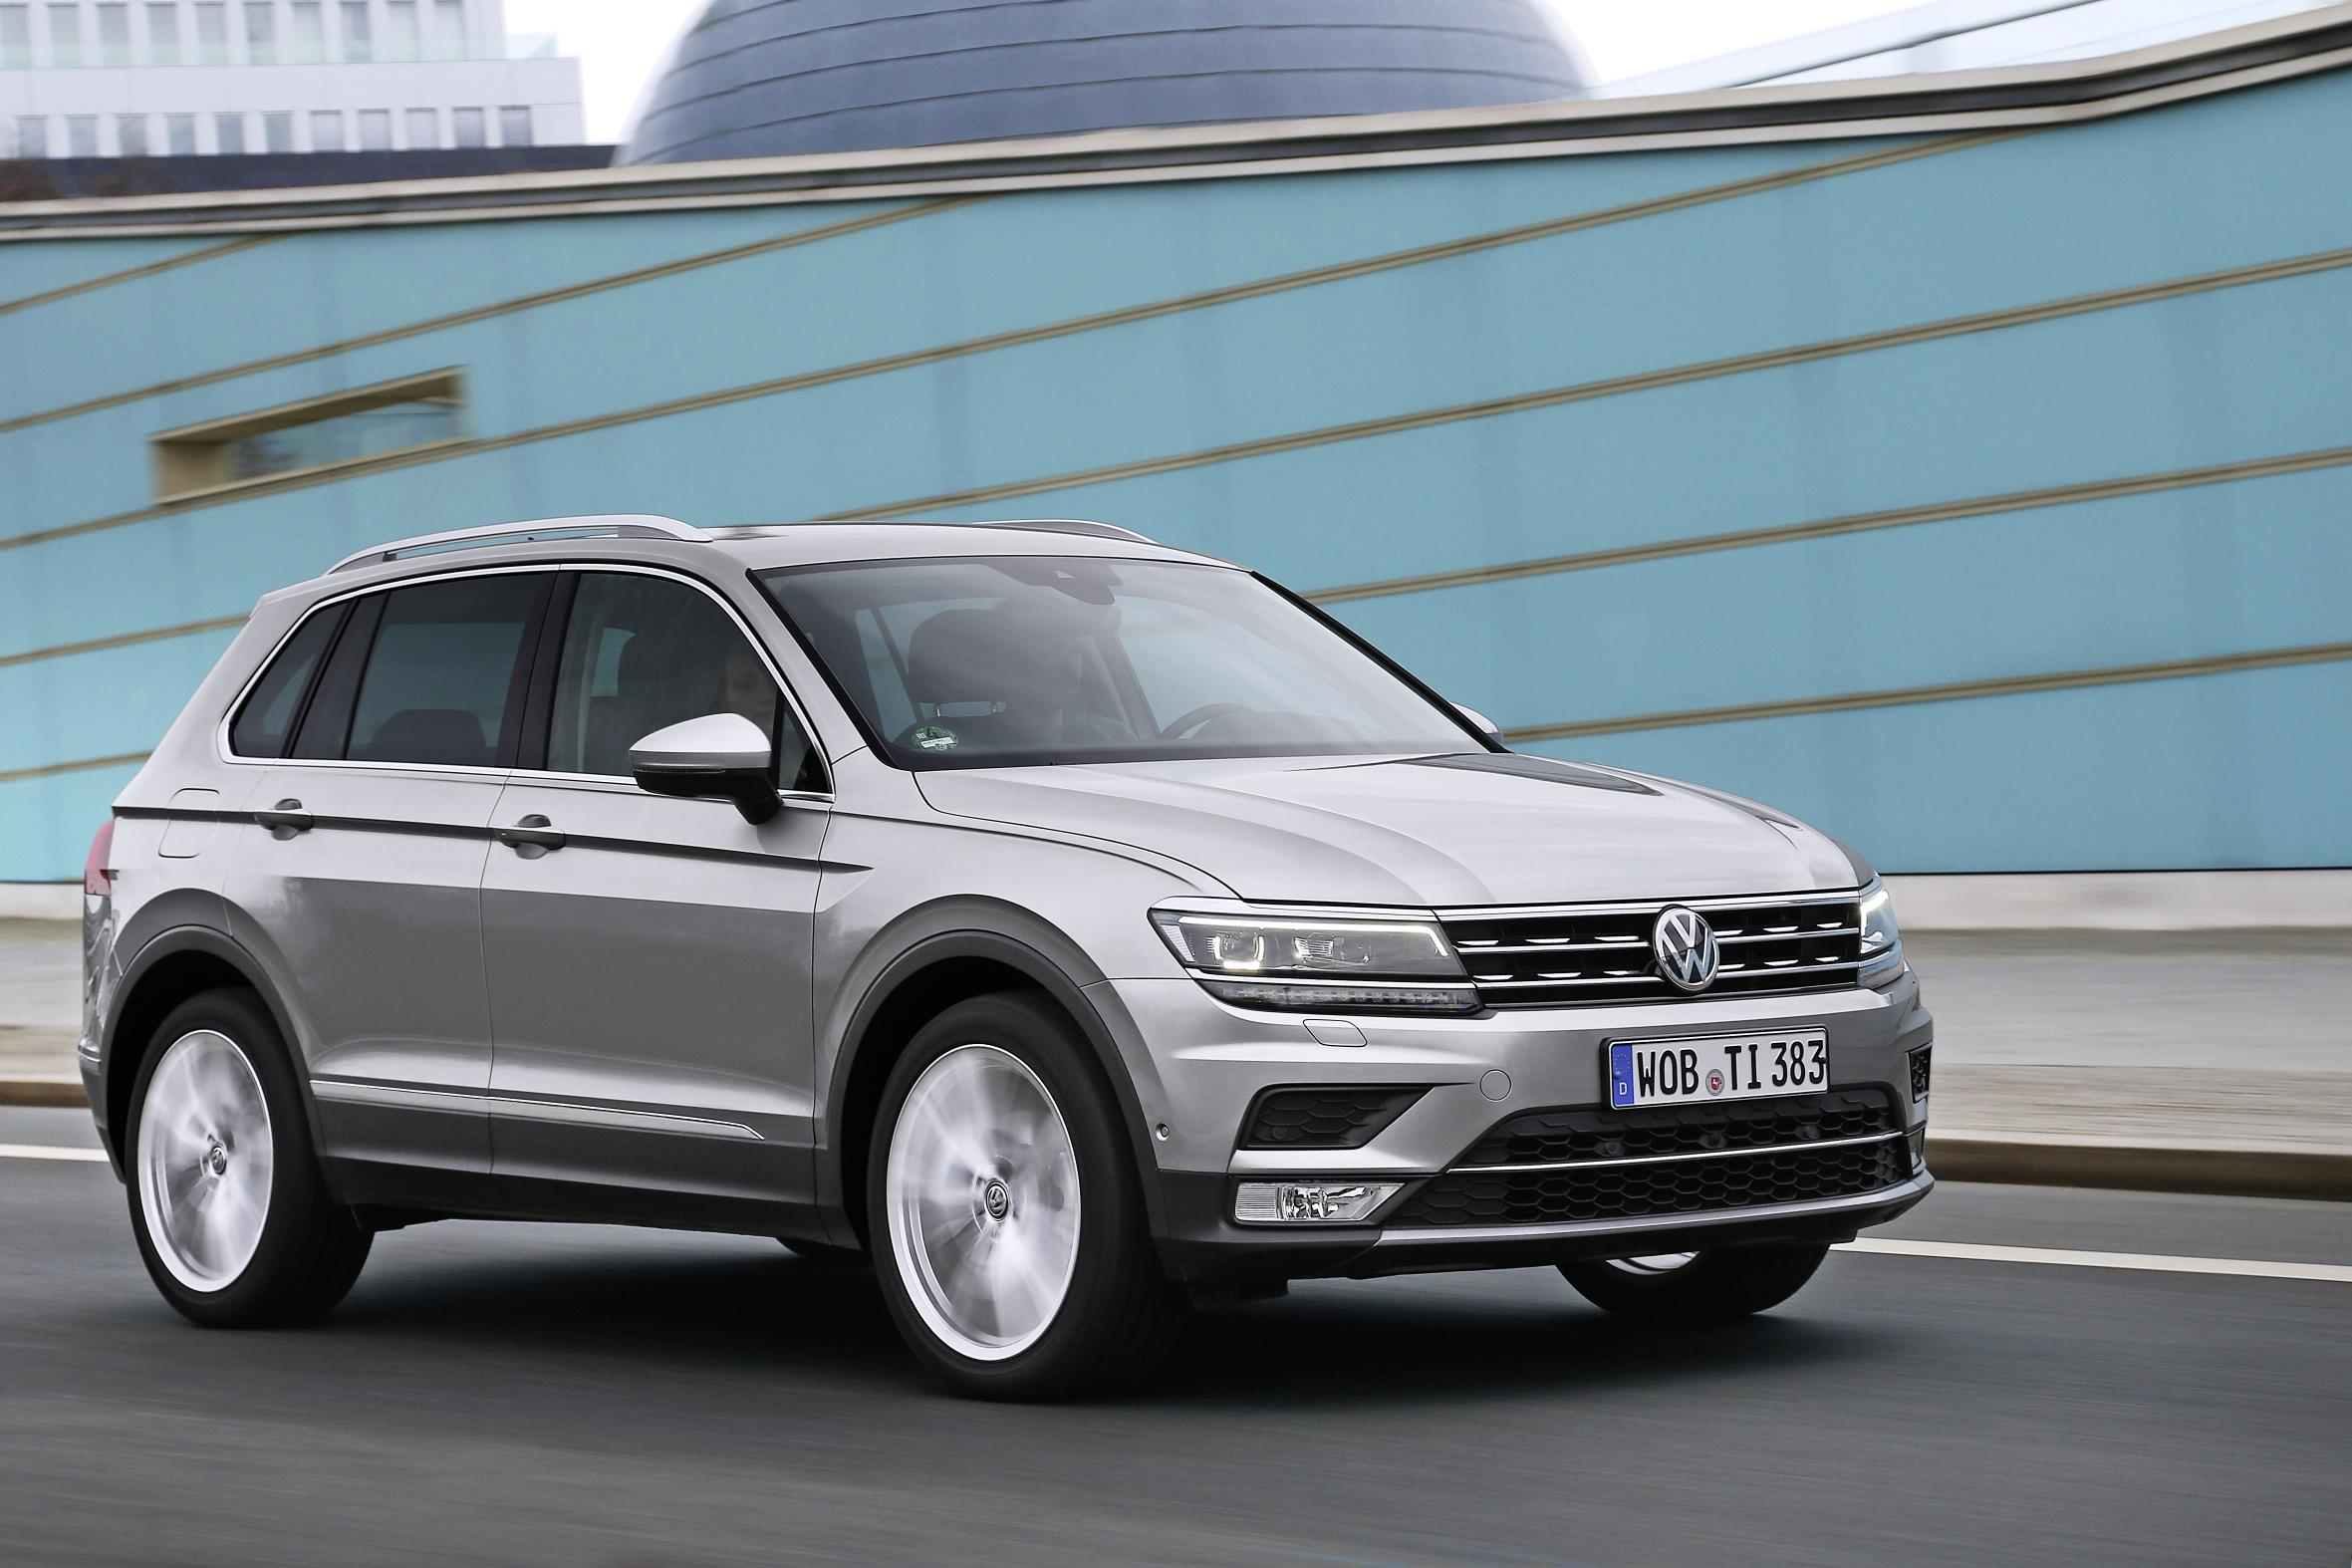 2016 Volkswagen Tiguan Goes on Sale in Britain from £ ...